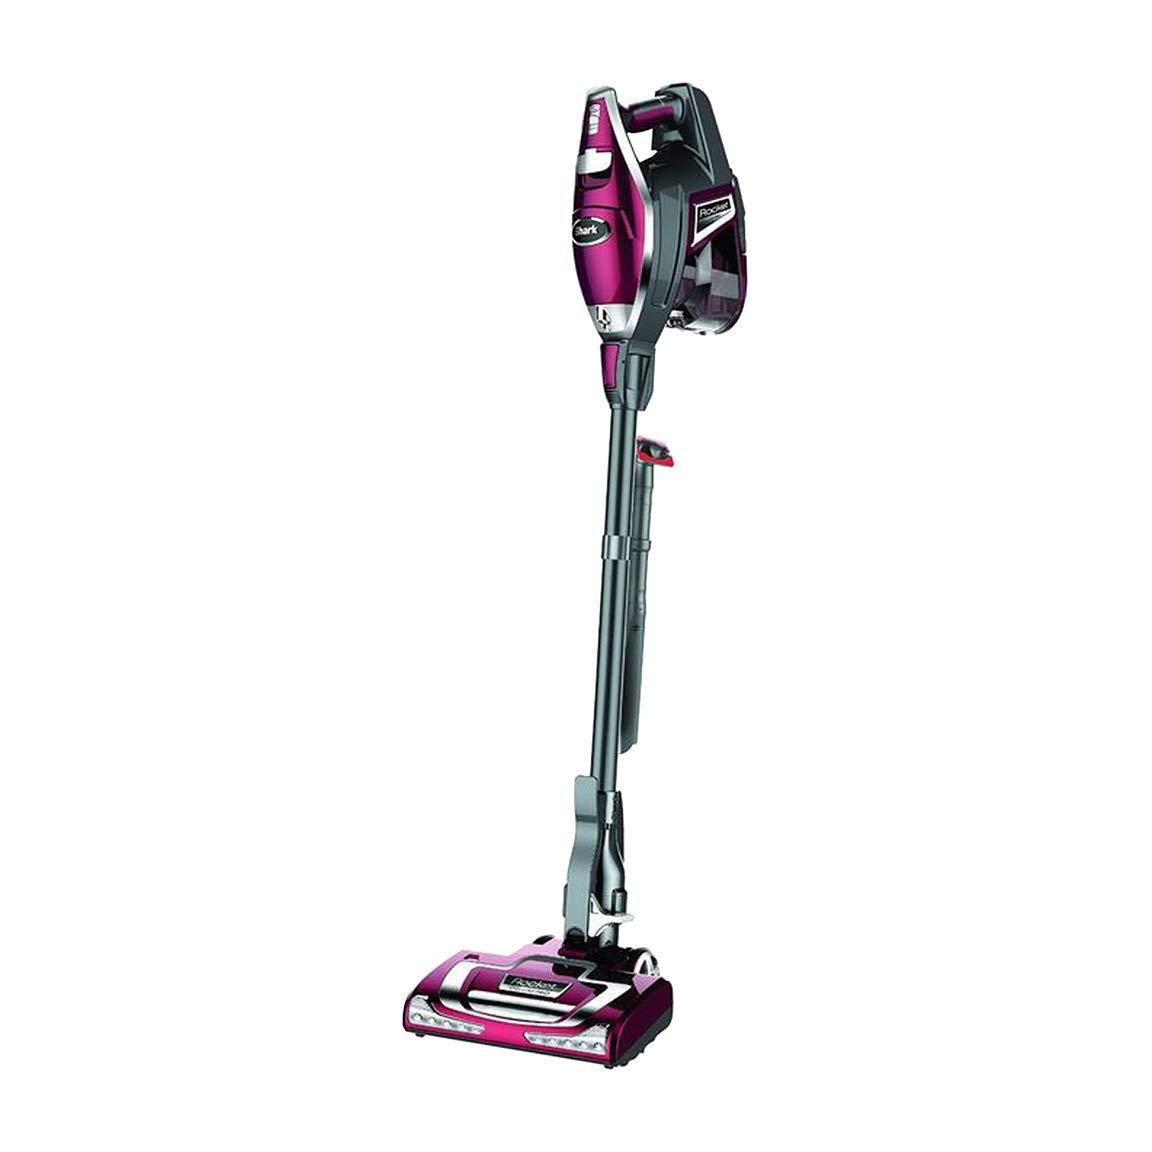 Shark Rocket True Pet Ultra Light Upright Vacuum Cleaner (Renewed)